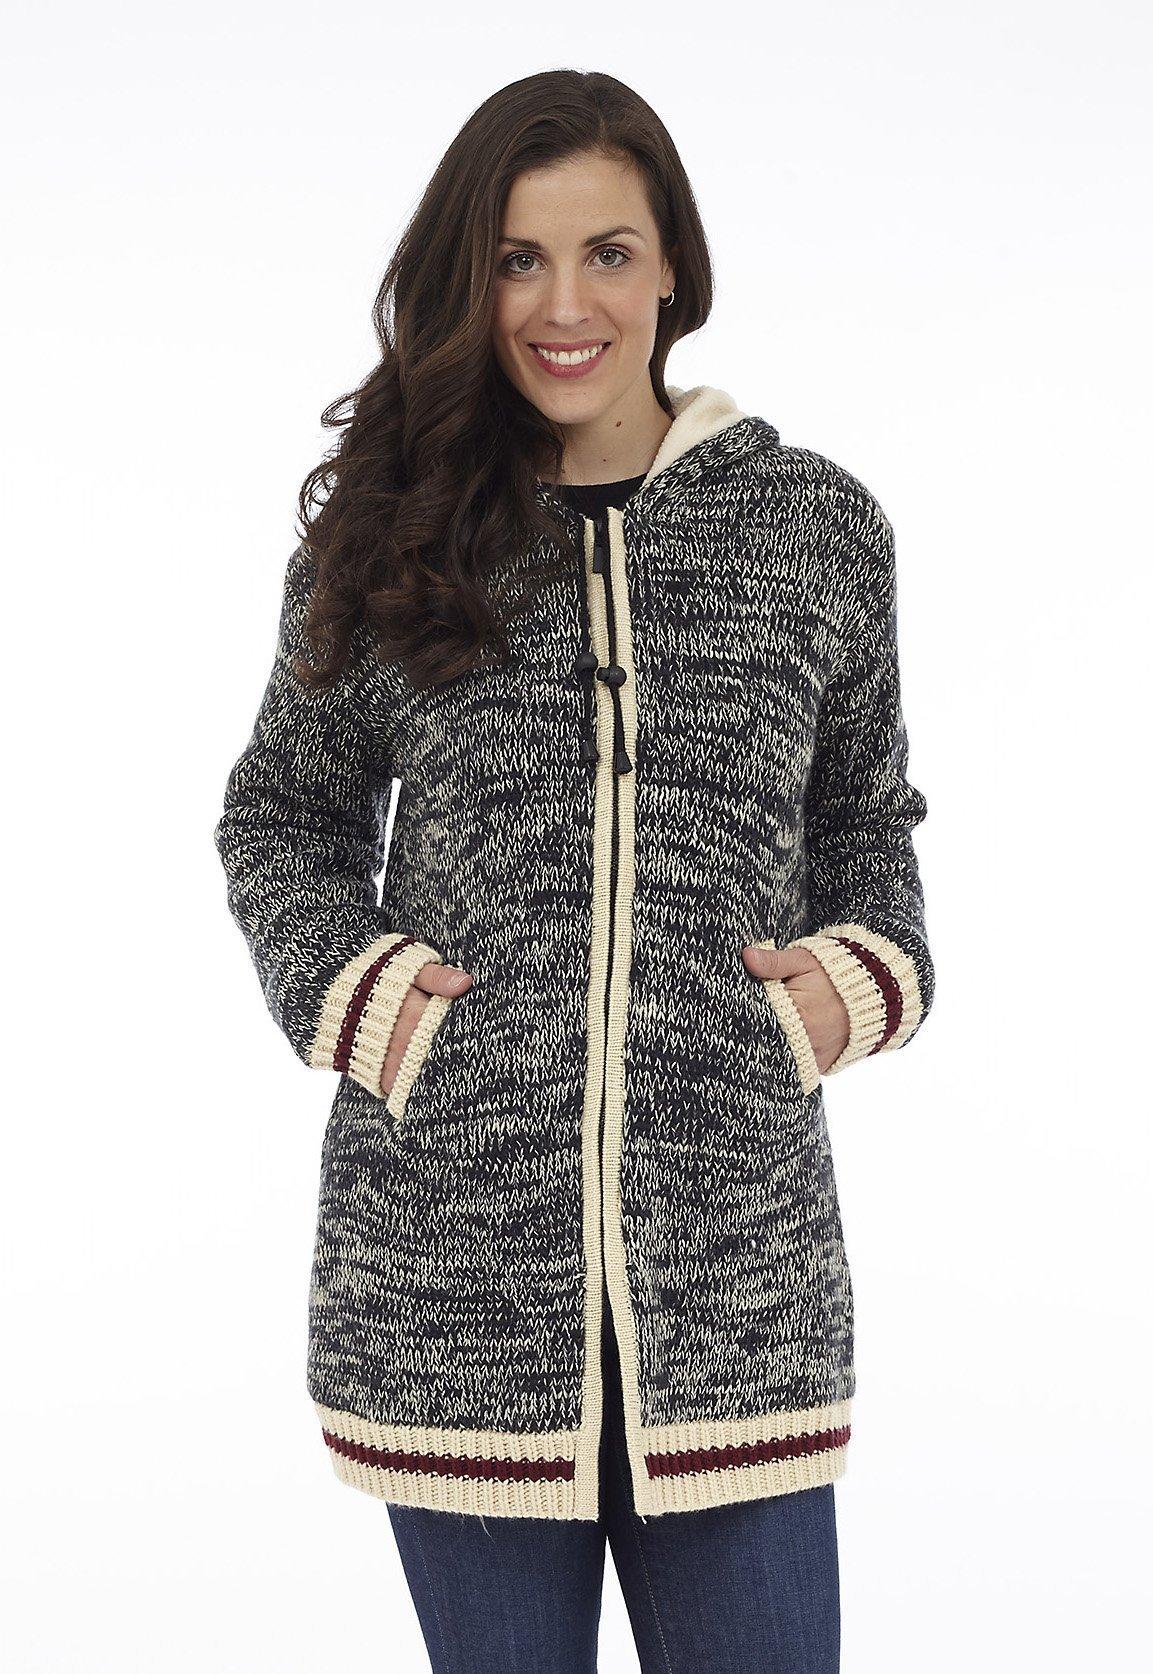 Full Zip Hooded Long Sweater Jacket